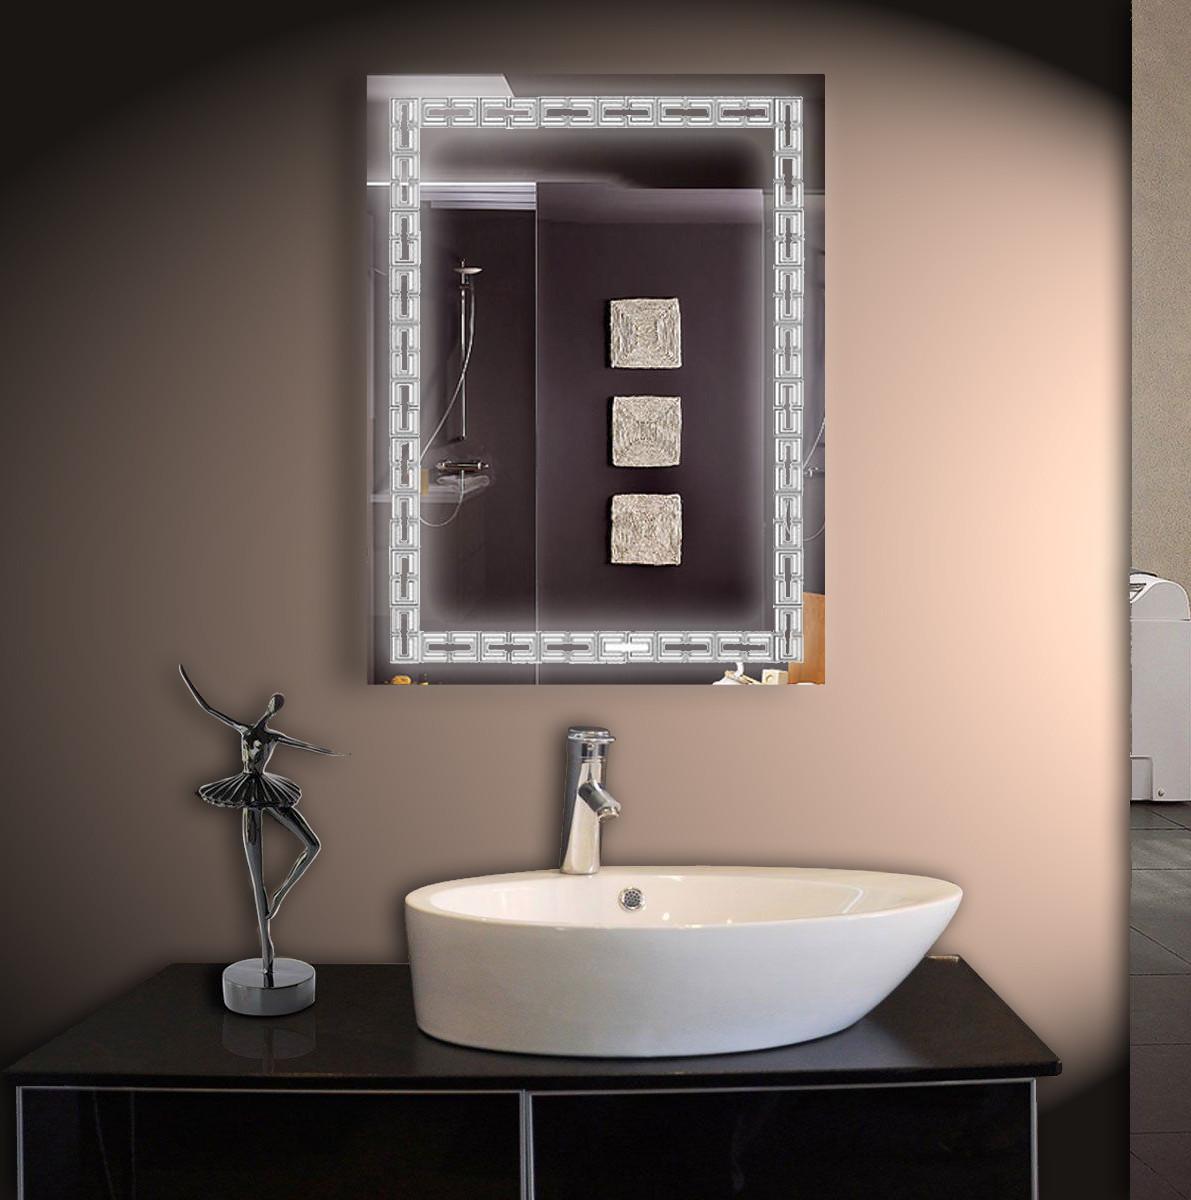 Зеркало LED со светодиодной подсветкой ver-3067 600х800 мм